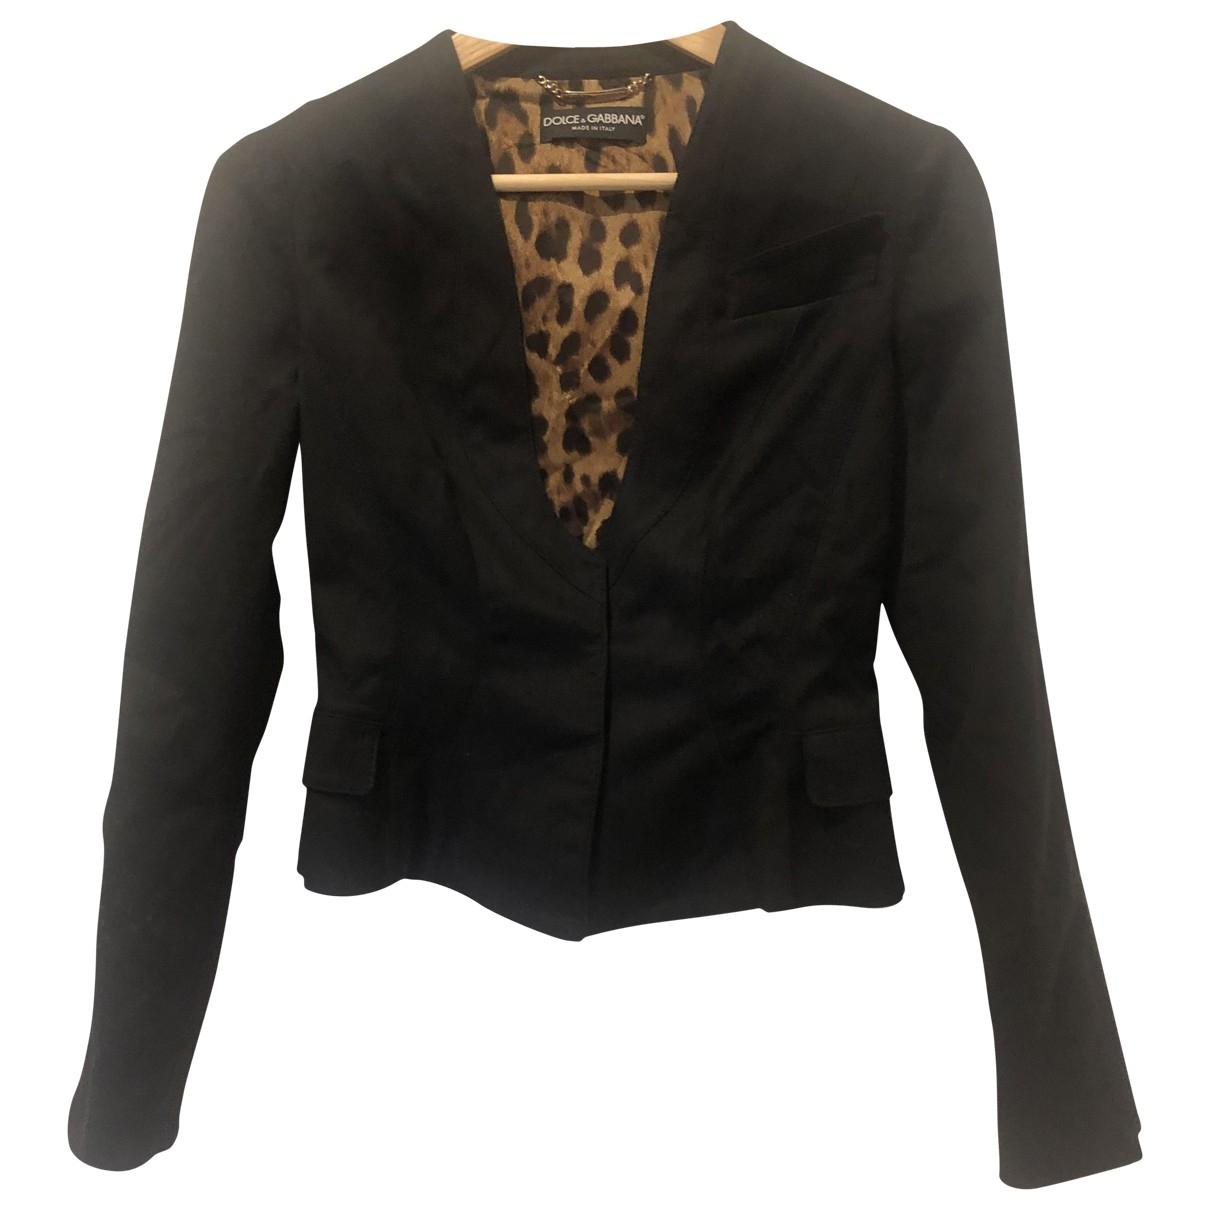 Dolce & Gabbana \N Jacke in  Schwarz Baumwolle